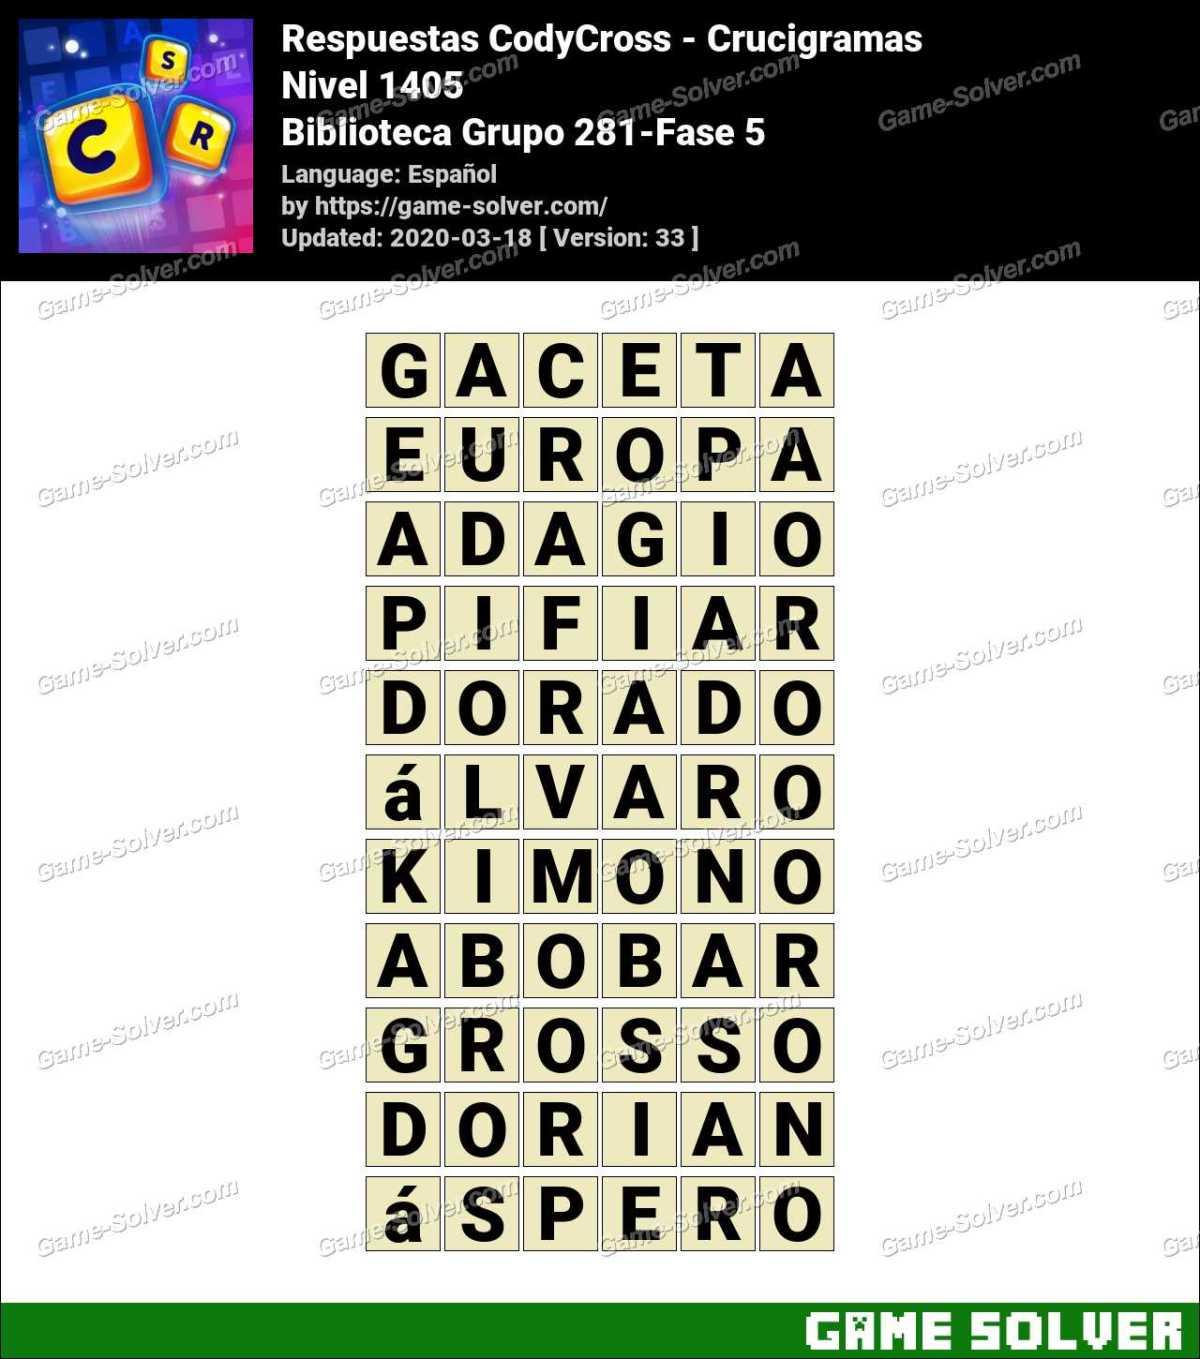 Respuestas CodyCross Biblioteca Grupo 281-Fase 5